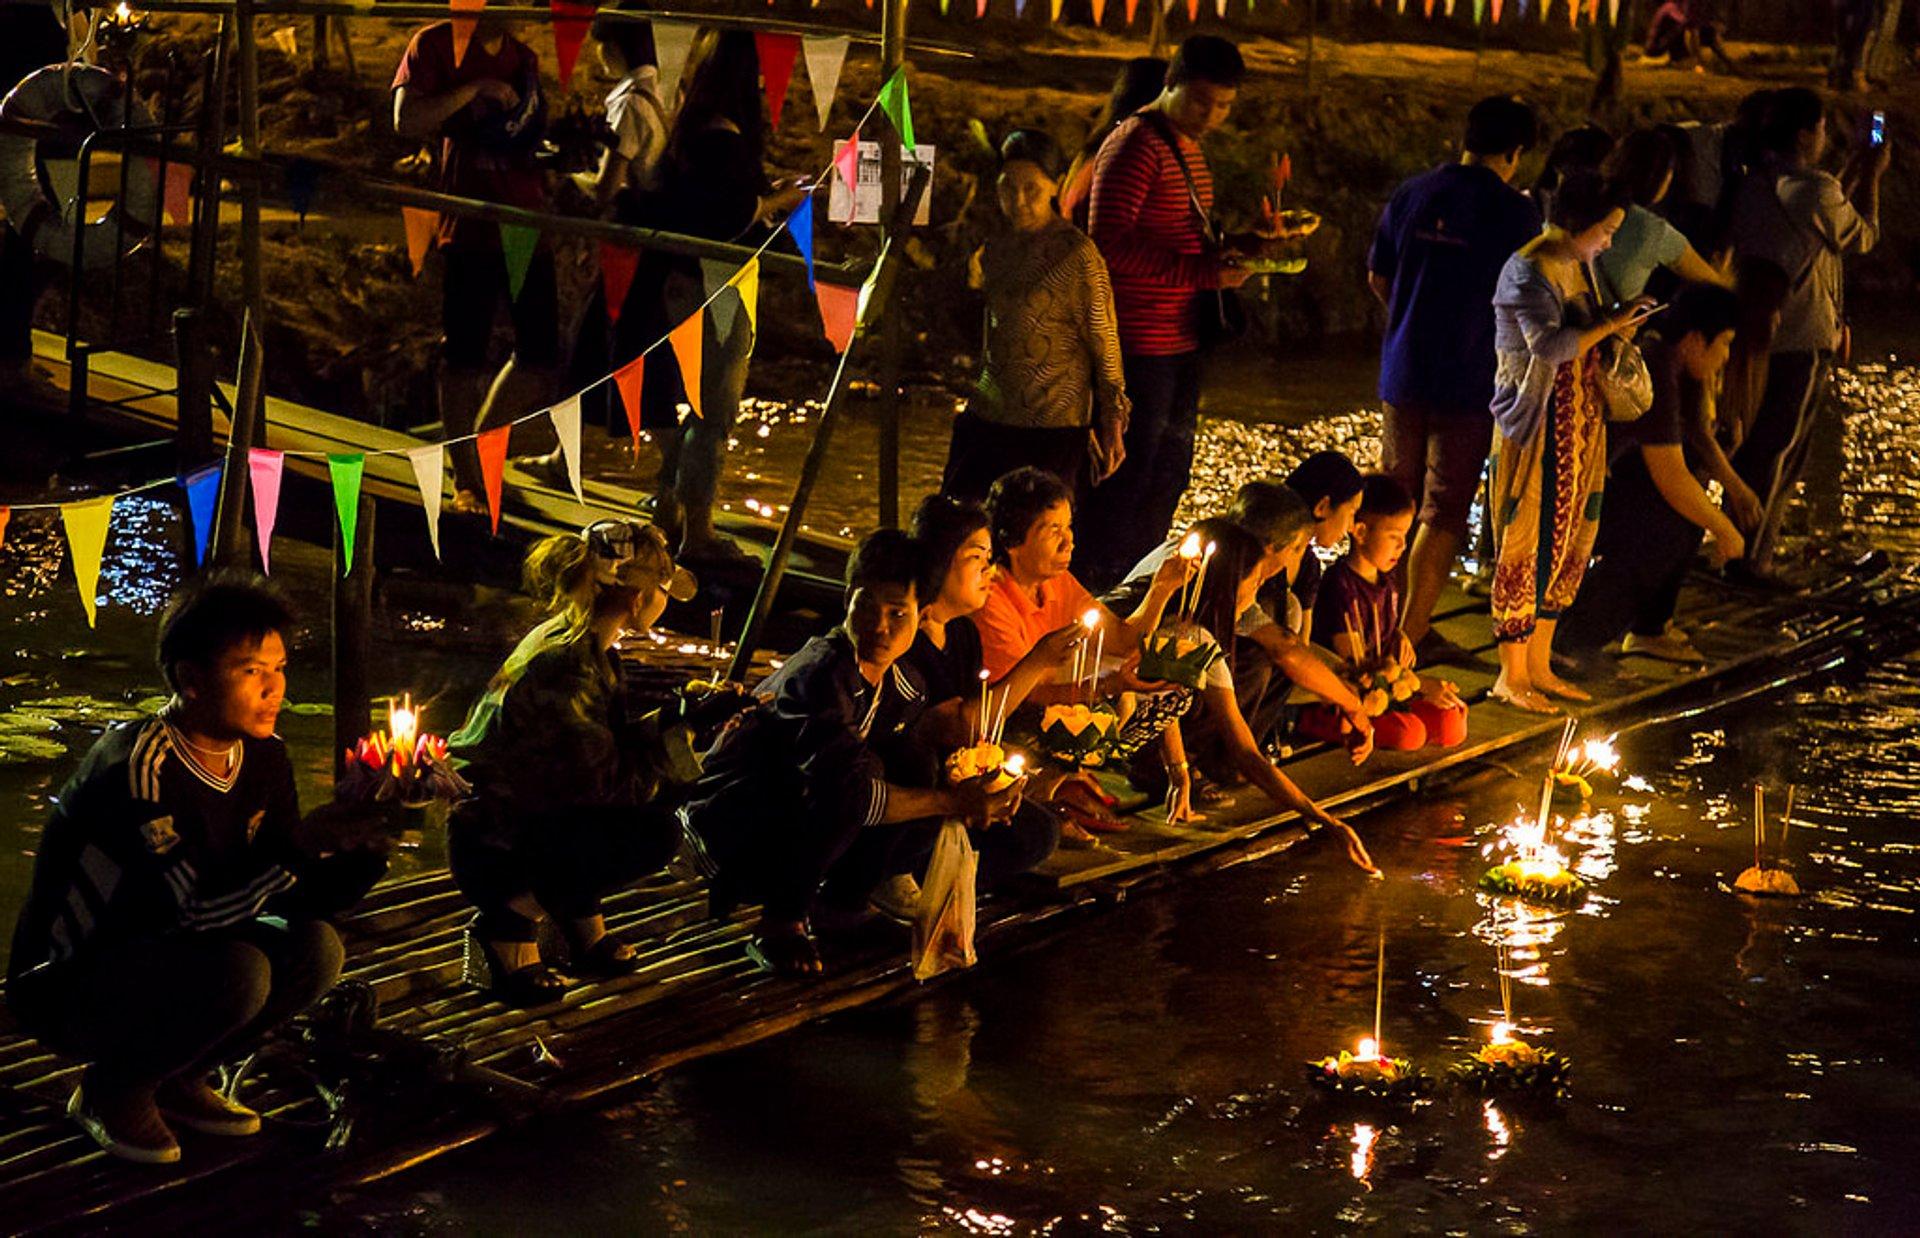 Loi Krathong celebrations in Chiang Mai 2020